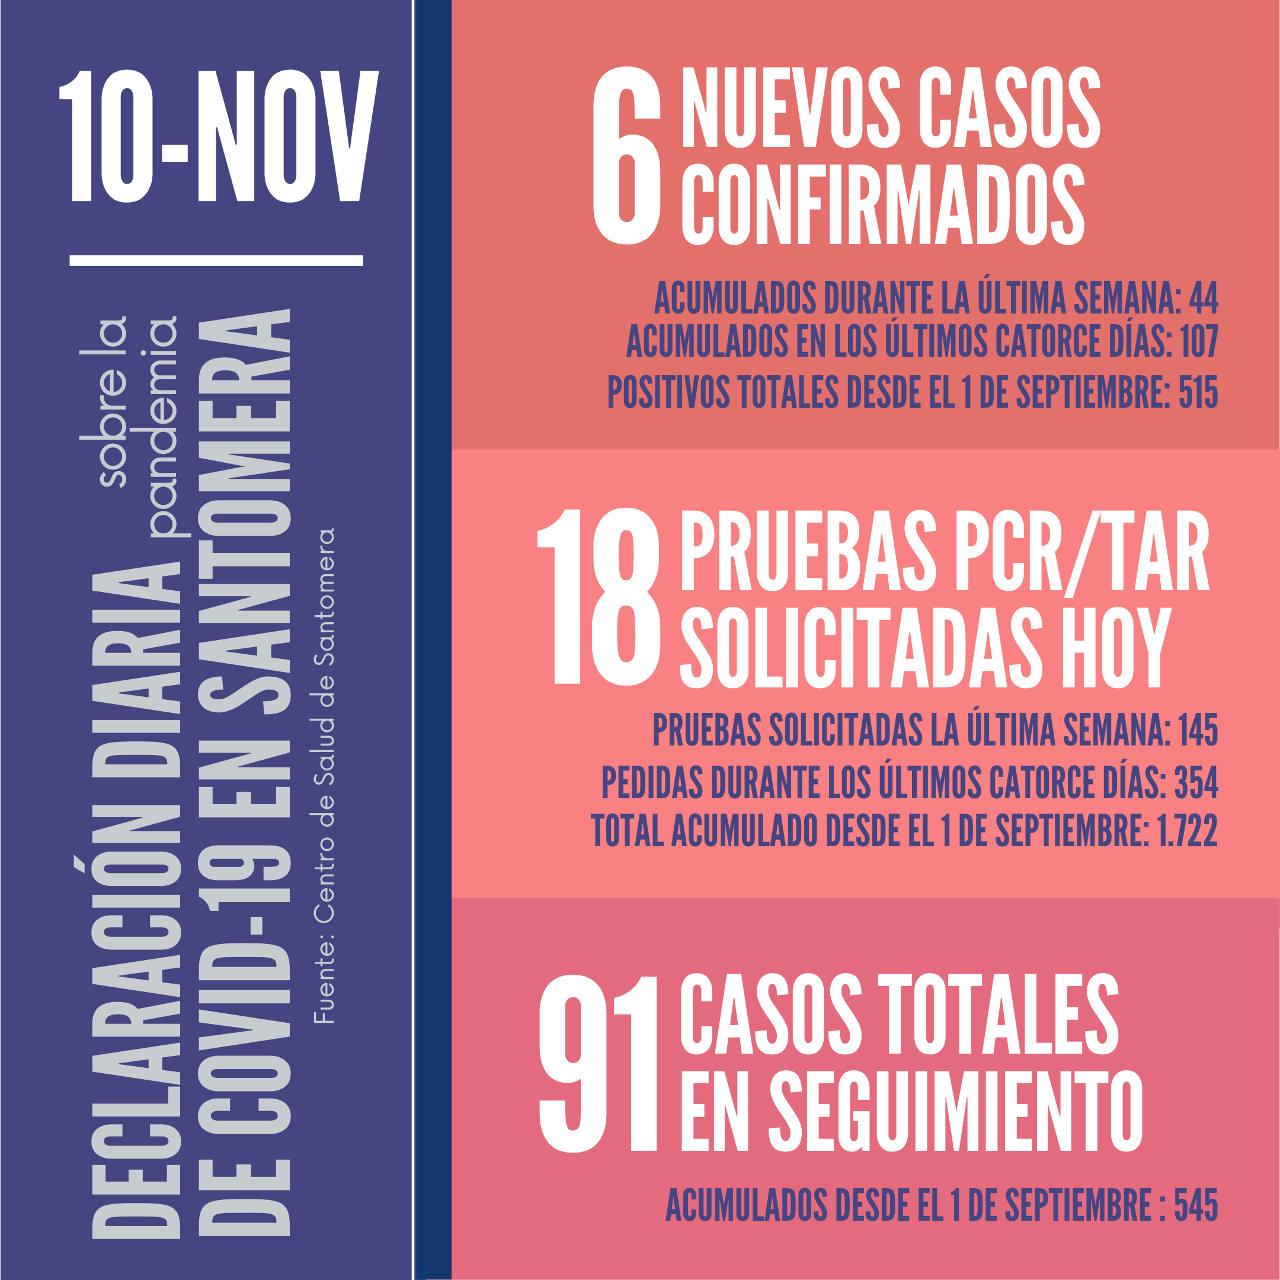 20201110_Datos COVID-19 Santomera